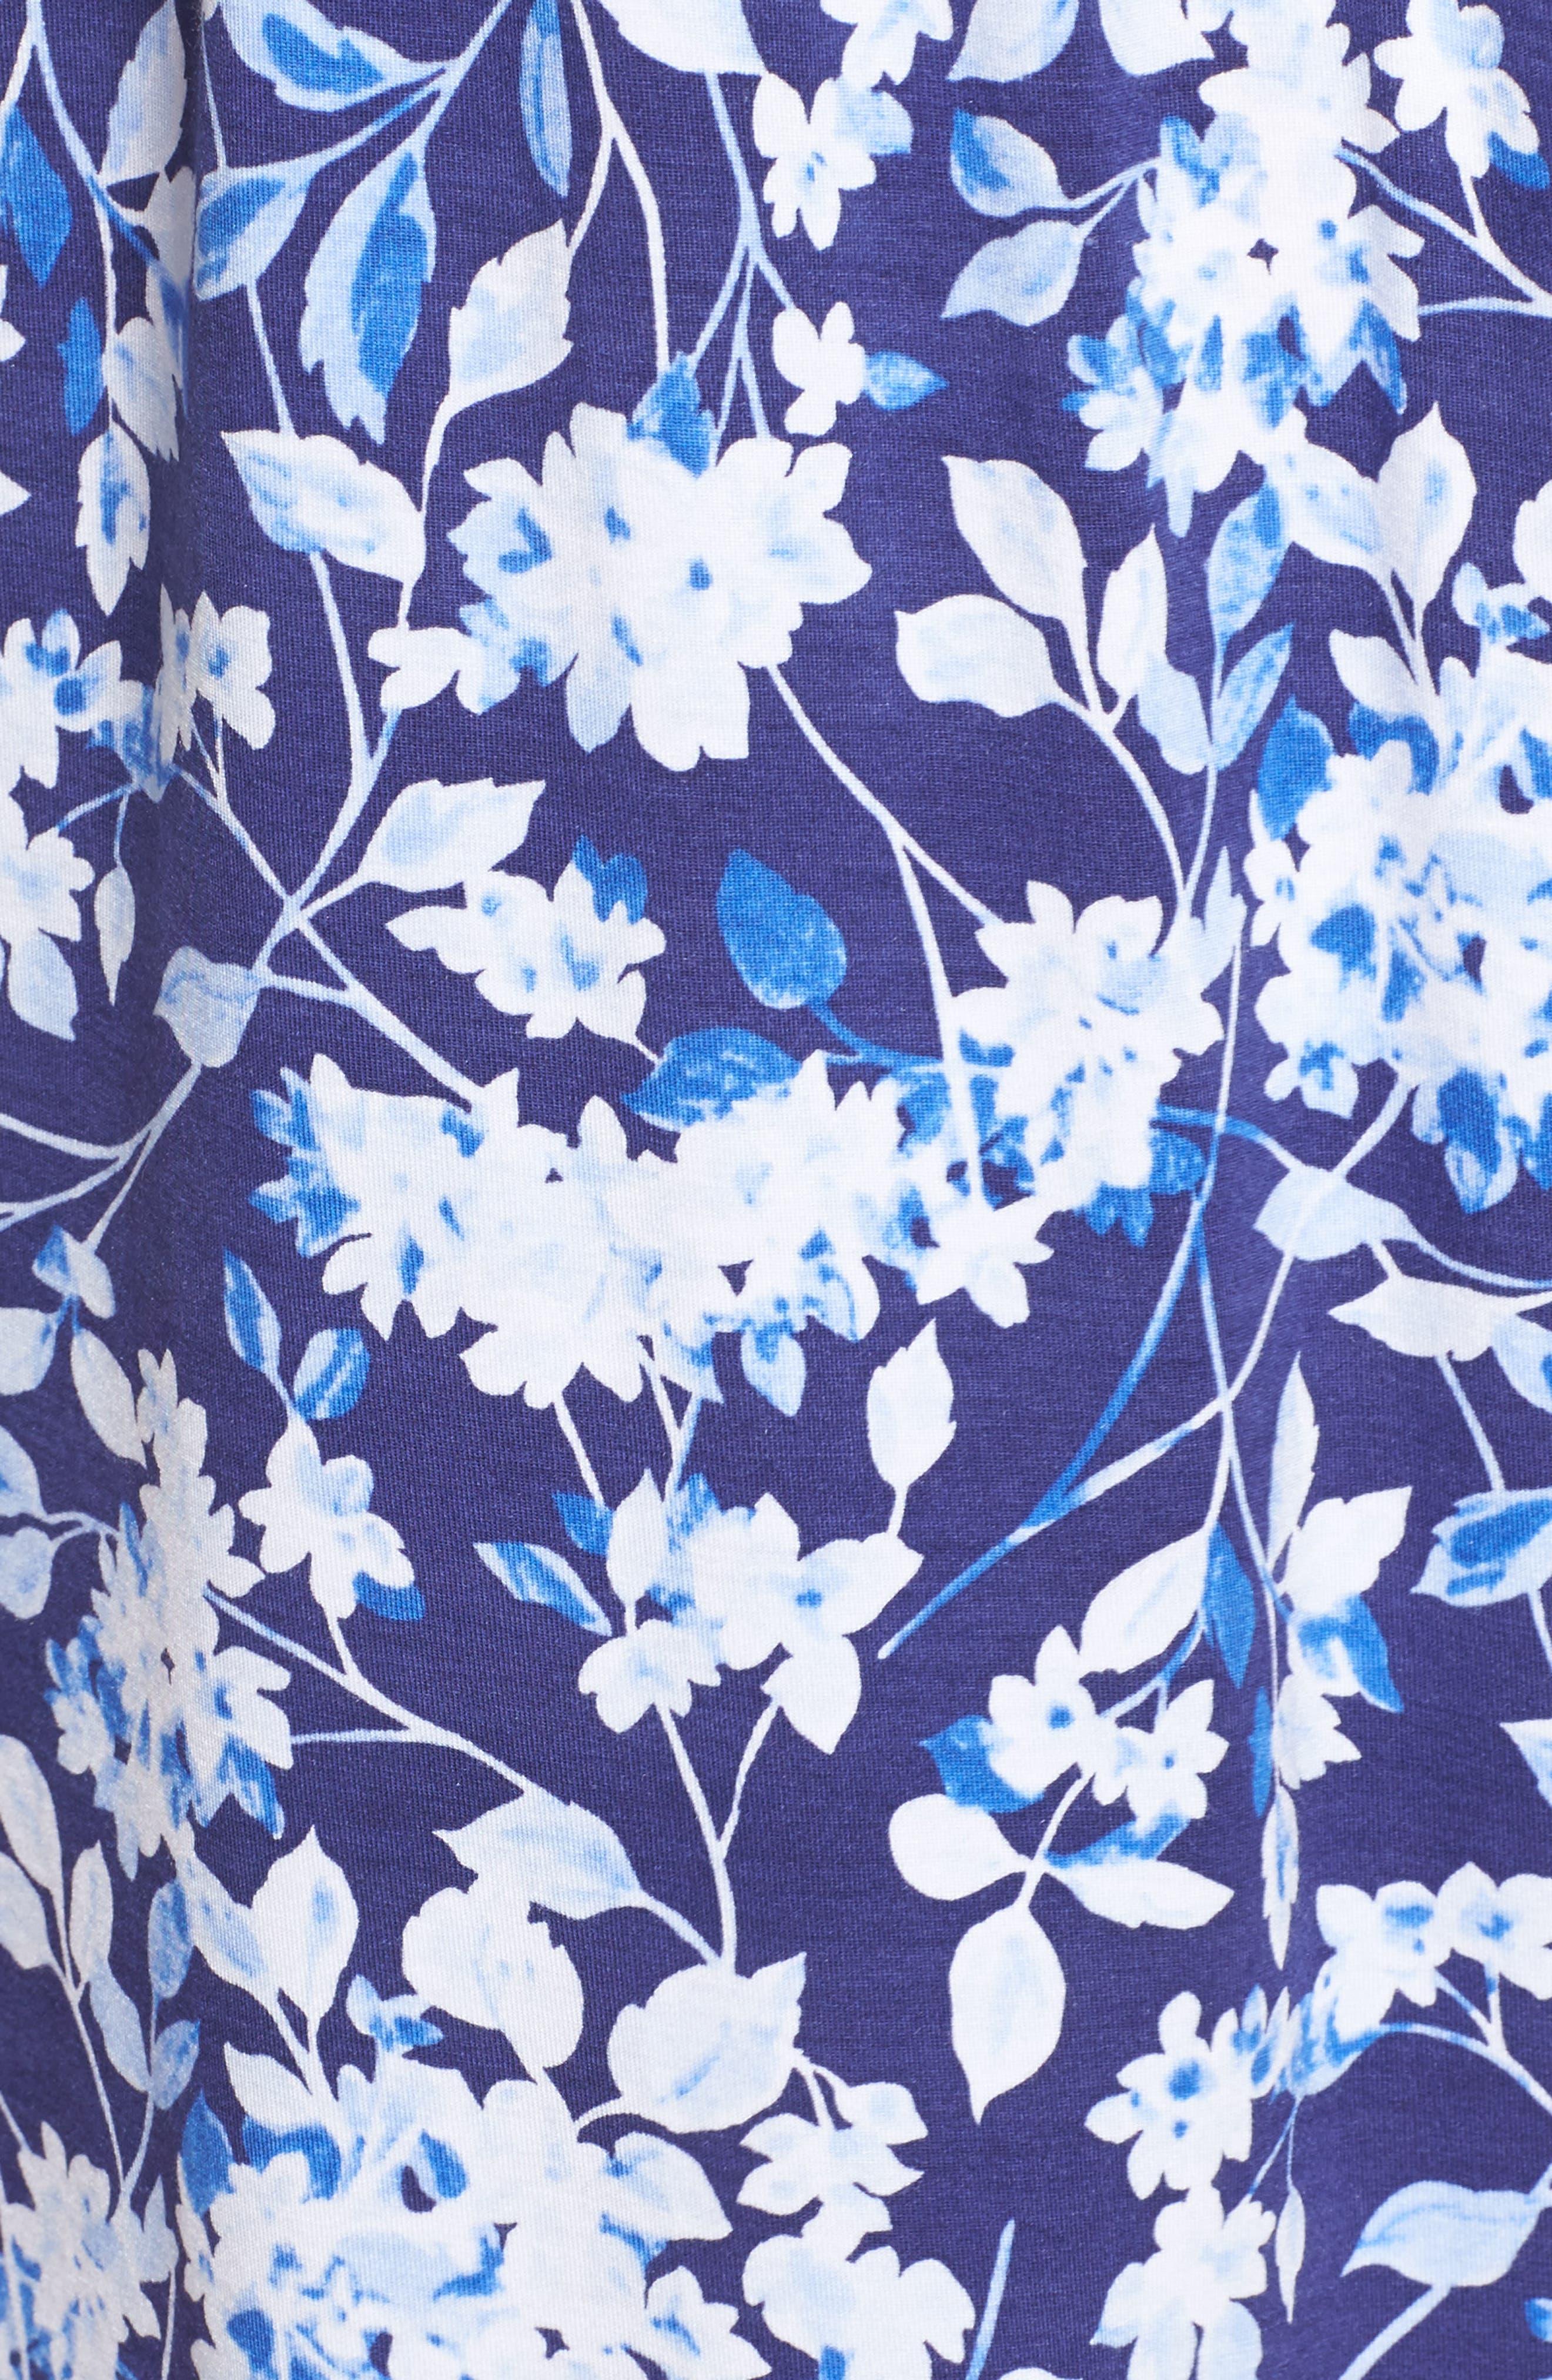 Waltz Nightgown,                             Alternate thumbnail 5, color,                             Blue Multi Floral